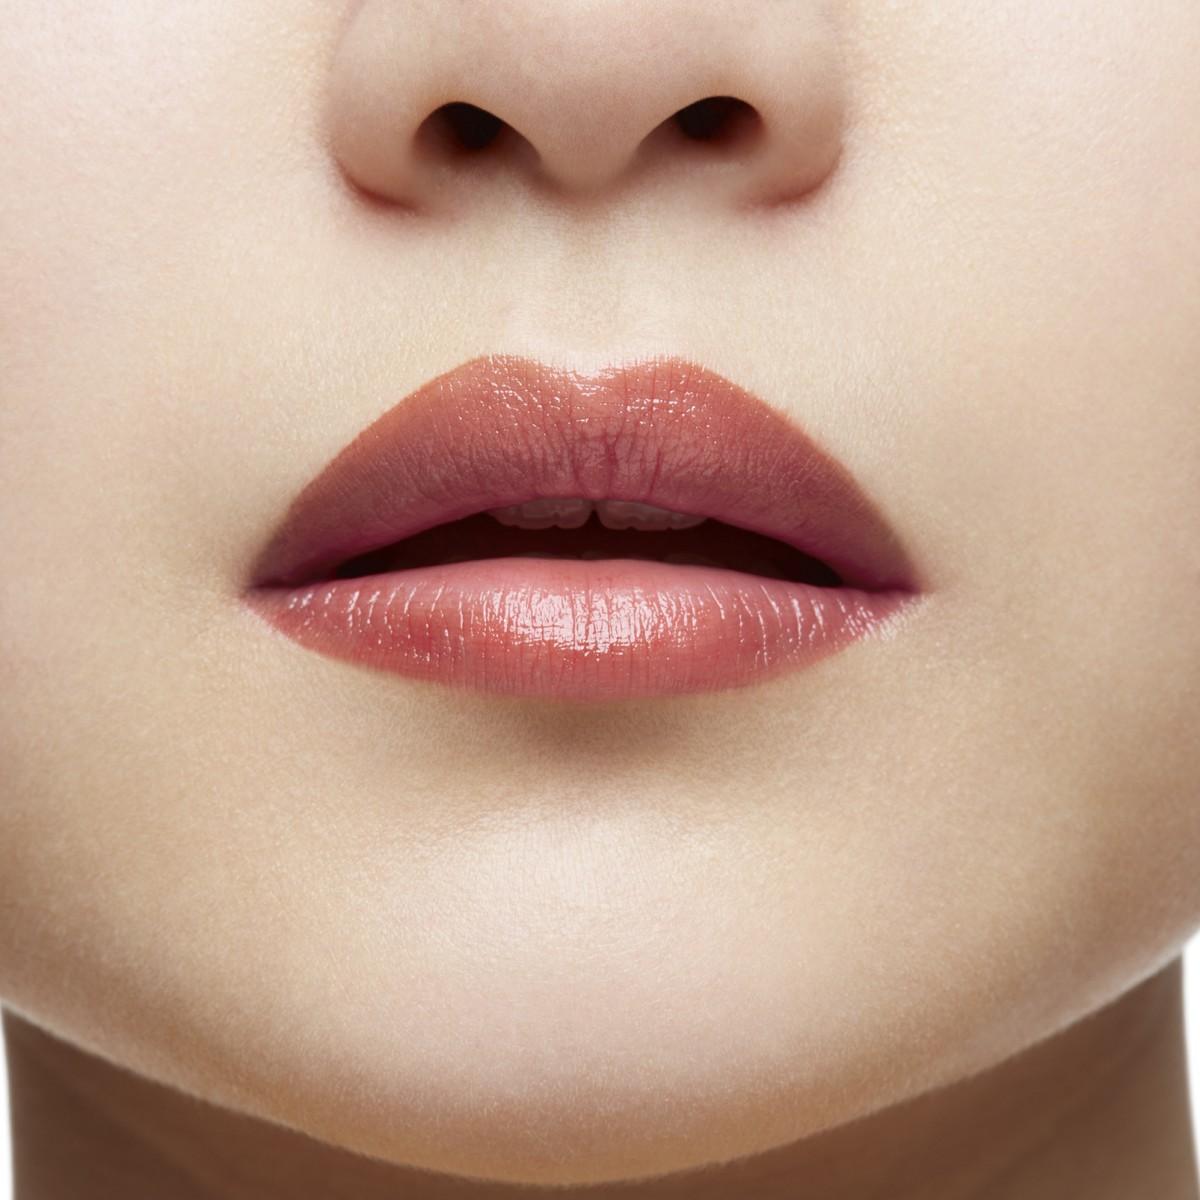 Woman Beauty - Rose Du Desert - Christian Louboutin